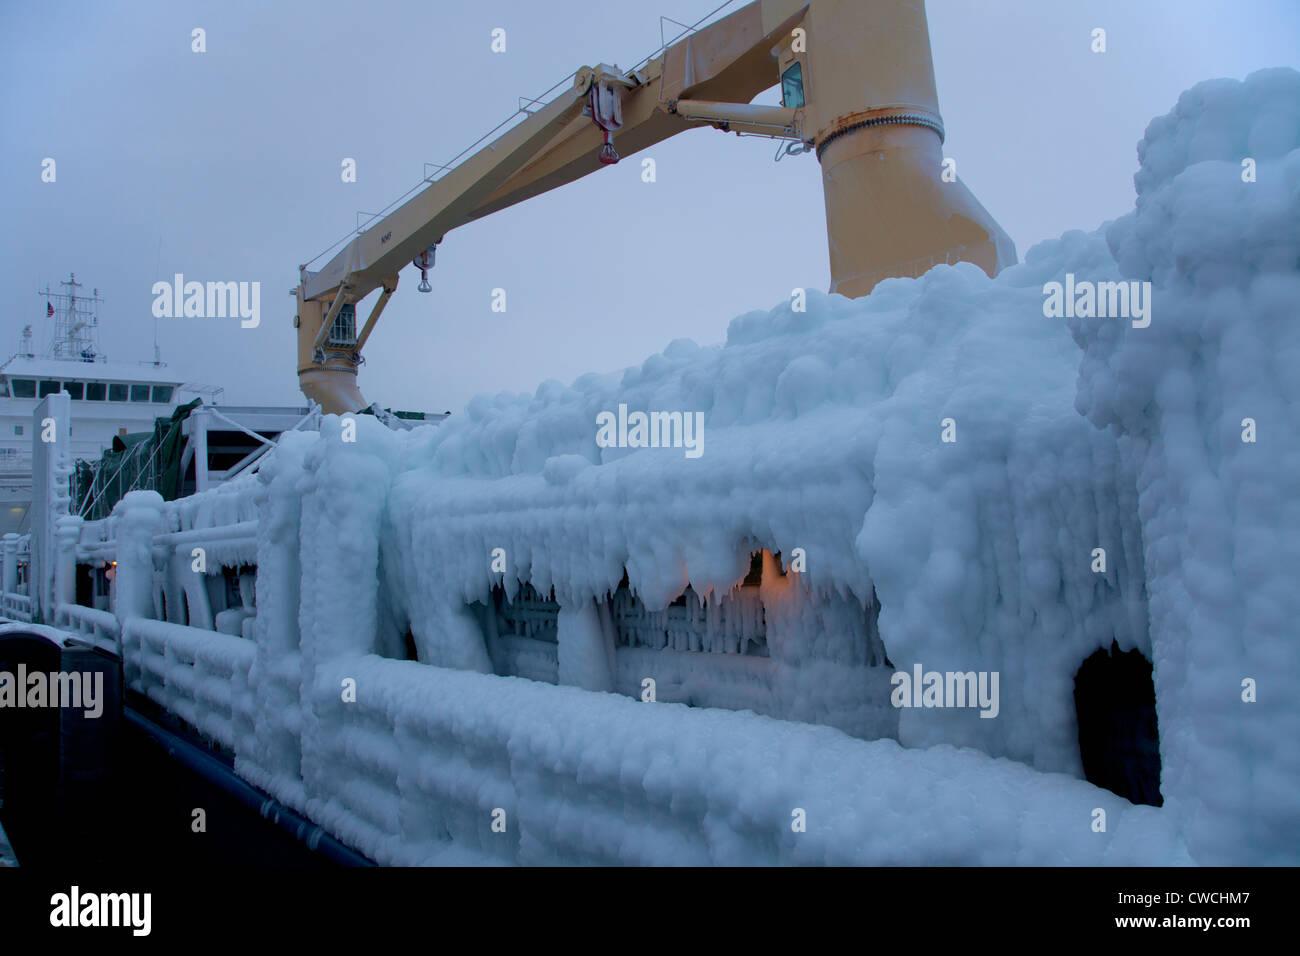 The cargo ship Susan K, Resurrection Bay, Seward, Alaska. - Stock Image